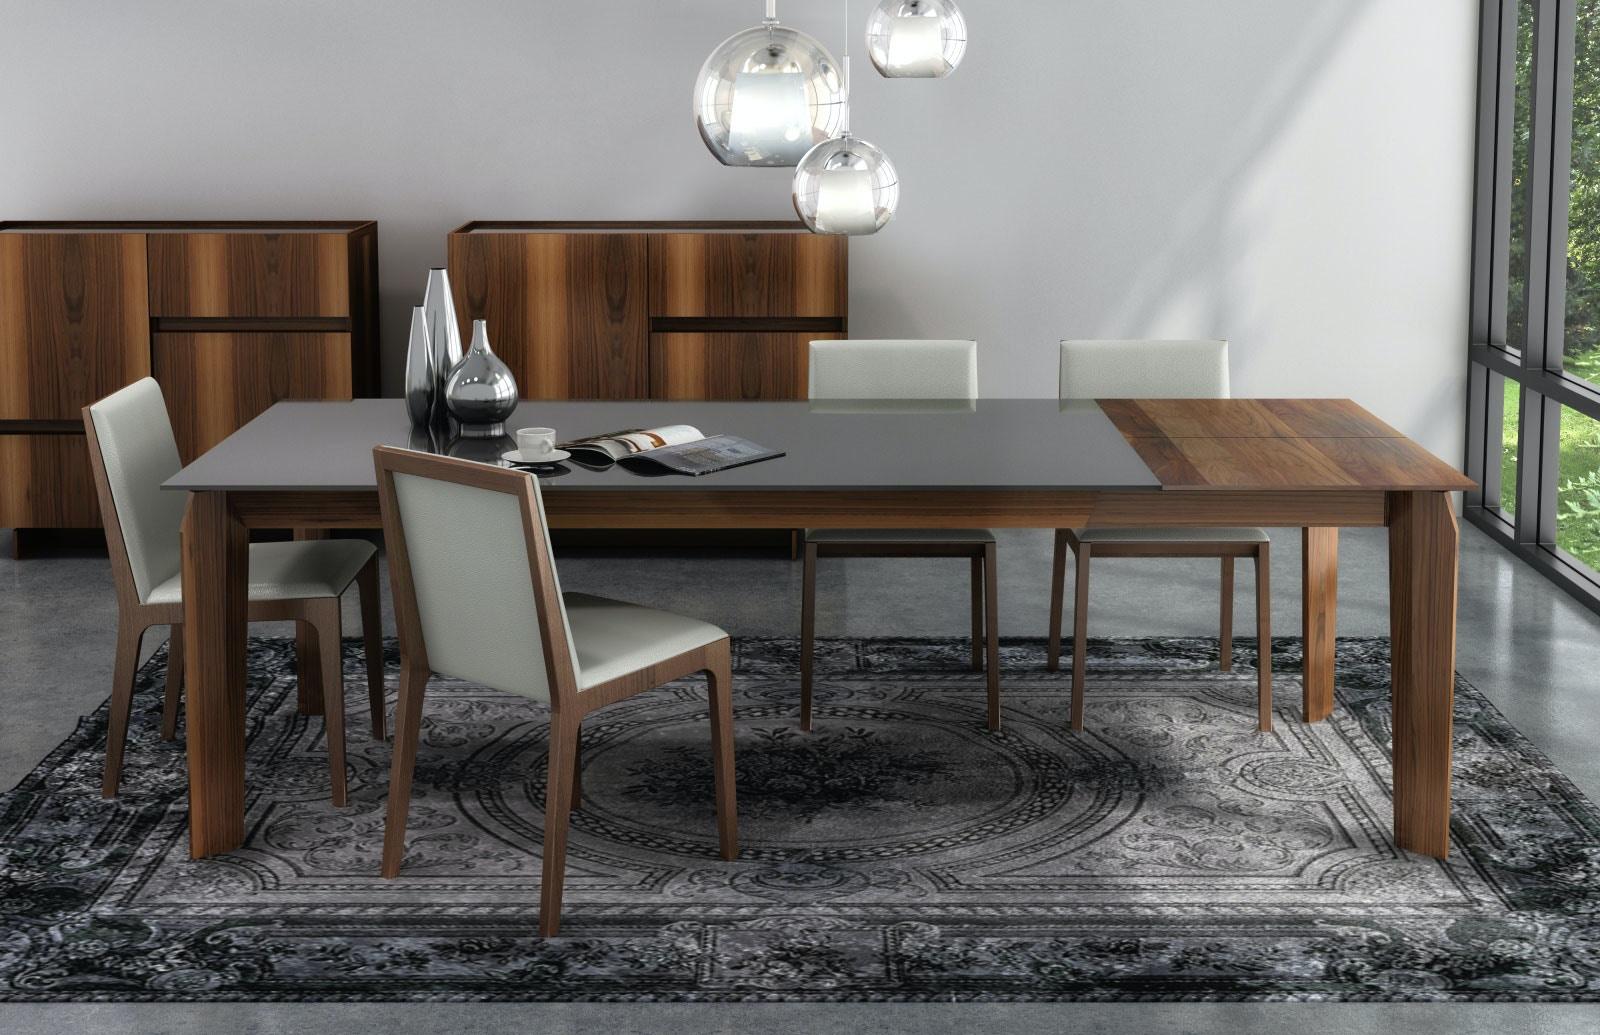 huppe dining room magnolia dining tablehuppÉ furniture 5089ve